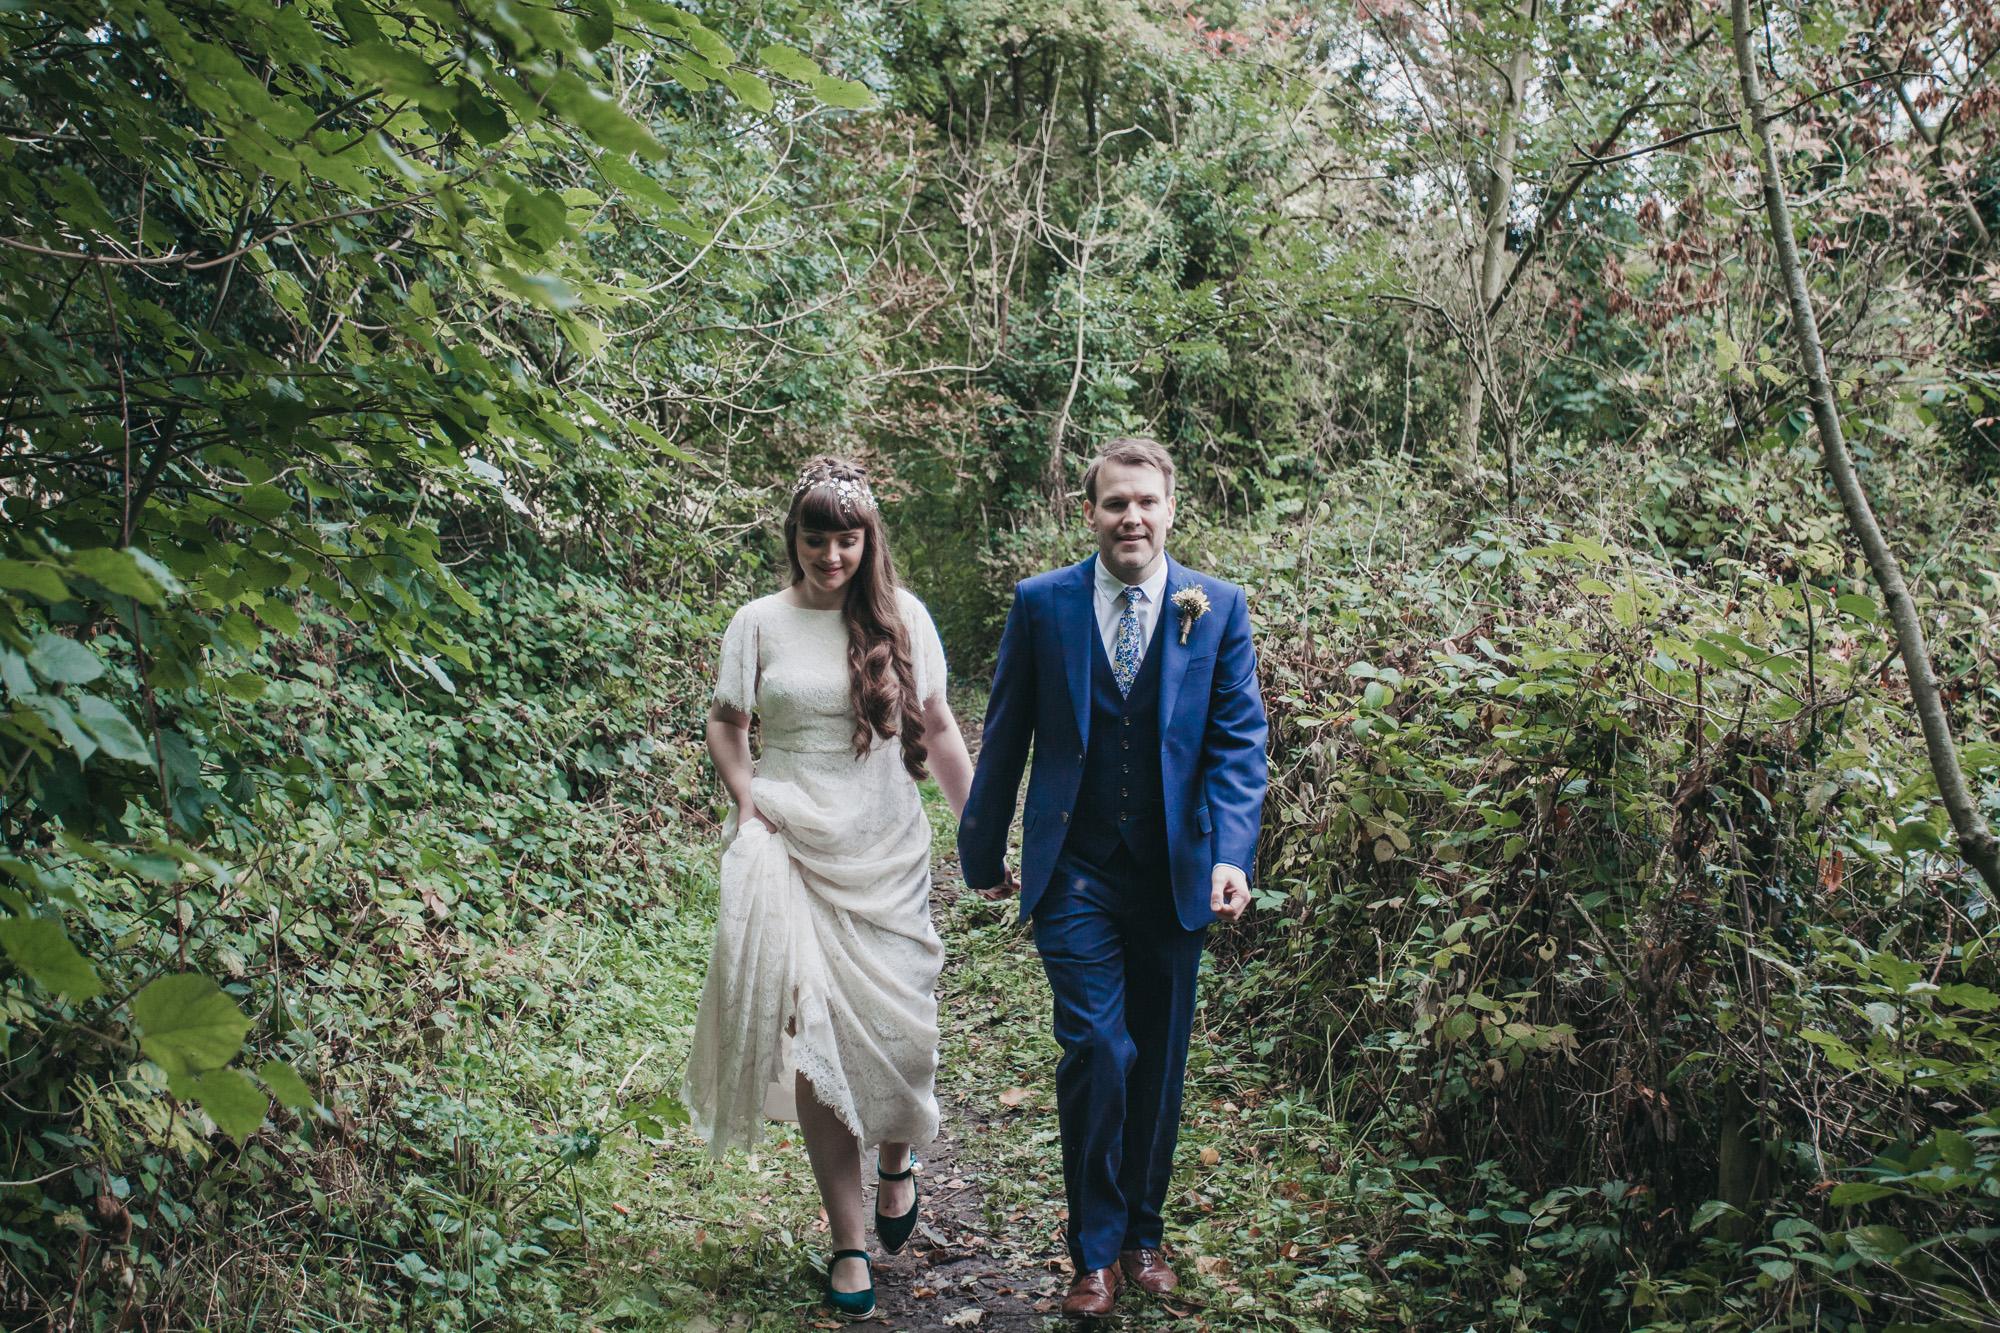 Kristy-Back-Garden-Outdoor-Wedding-Sheffield-Industrial-Warehouse-Wedding-Bohemian-Kate-Beaumont-Dahlia-Dress-31.jpg